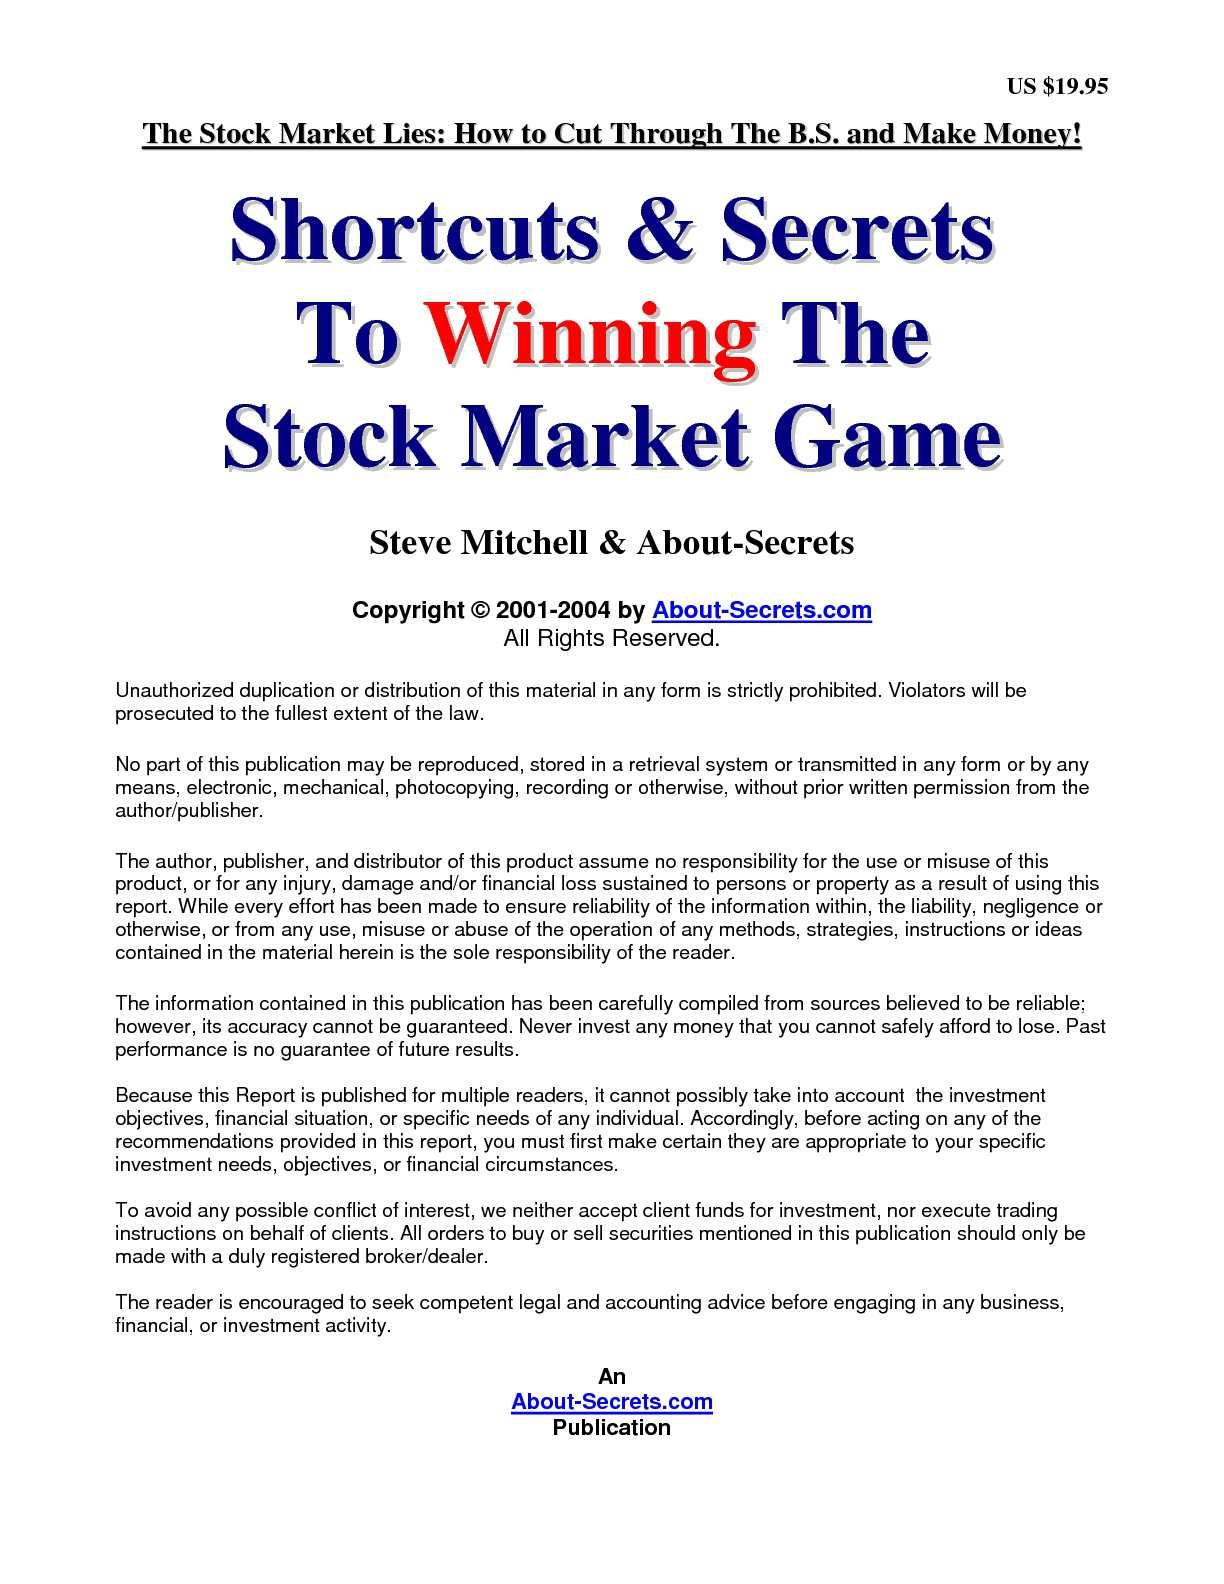 Calaméo - Steve Mitchell - Shortcuts & Secrets To Winning